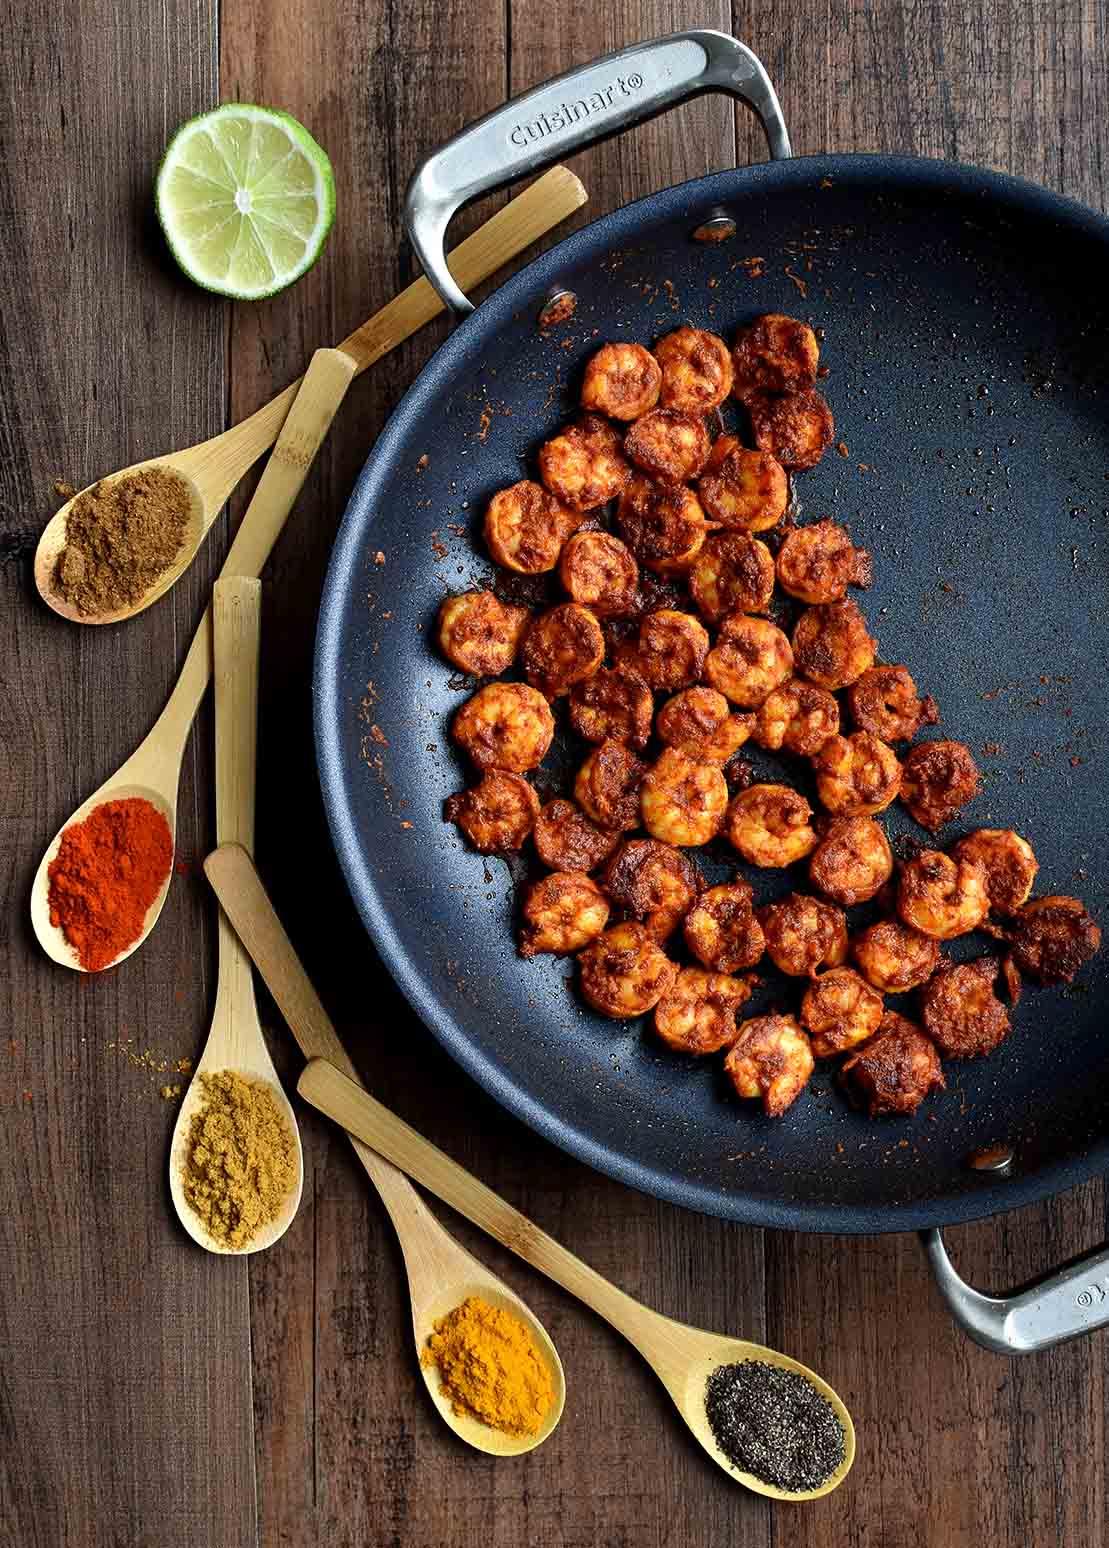 Prawn Biriyani - Pepper Delight #pepperdelightblog #recipe #prawn #shrimp #indian #chemmeen #biriyani #kerala #keralastylebiriyani #seafood #easy #prawnrecipes #nadan #prawnbiriyani